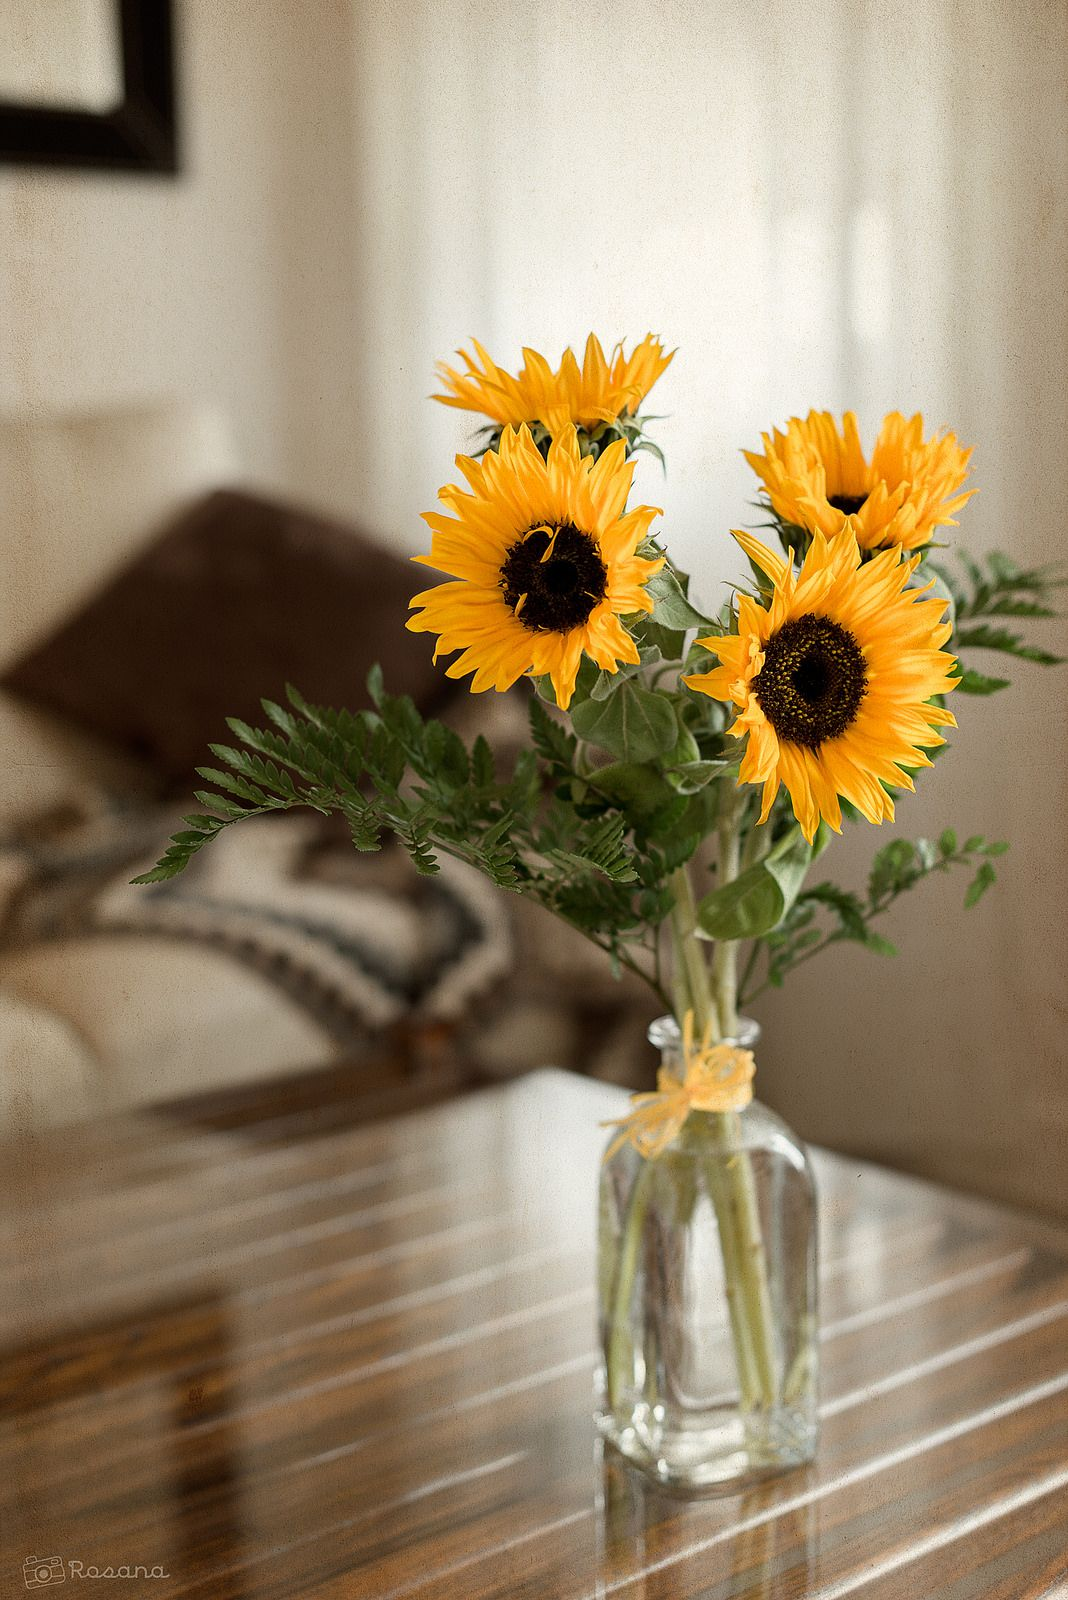 Sunflowers Sunflower, Beautiful blooms, Flowers